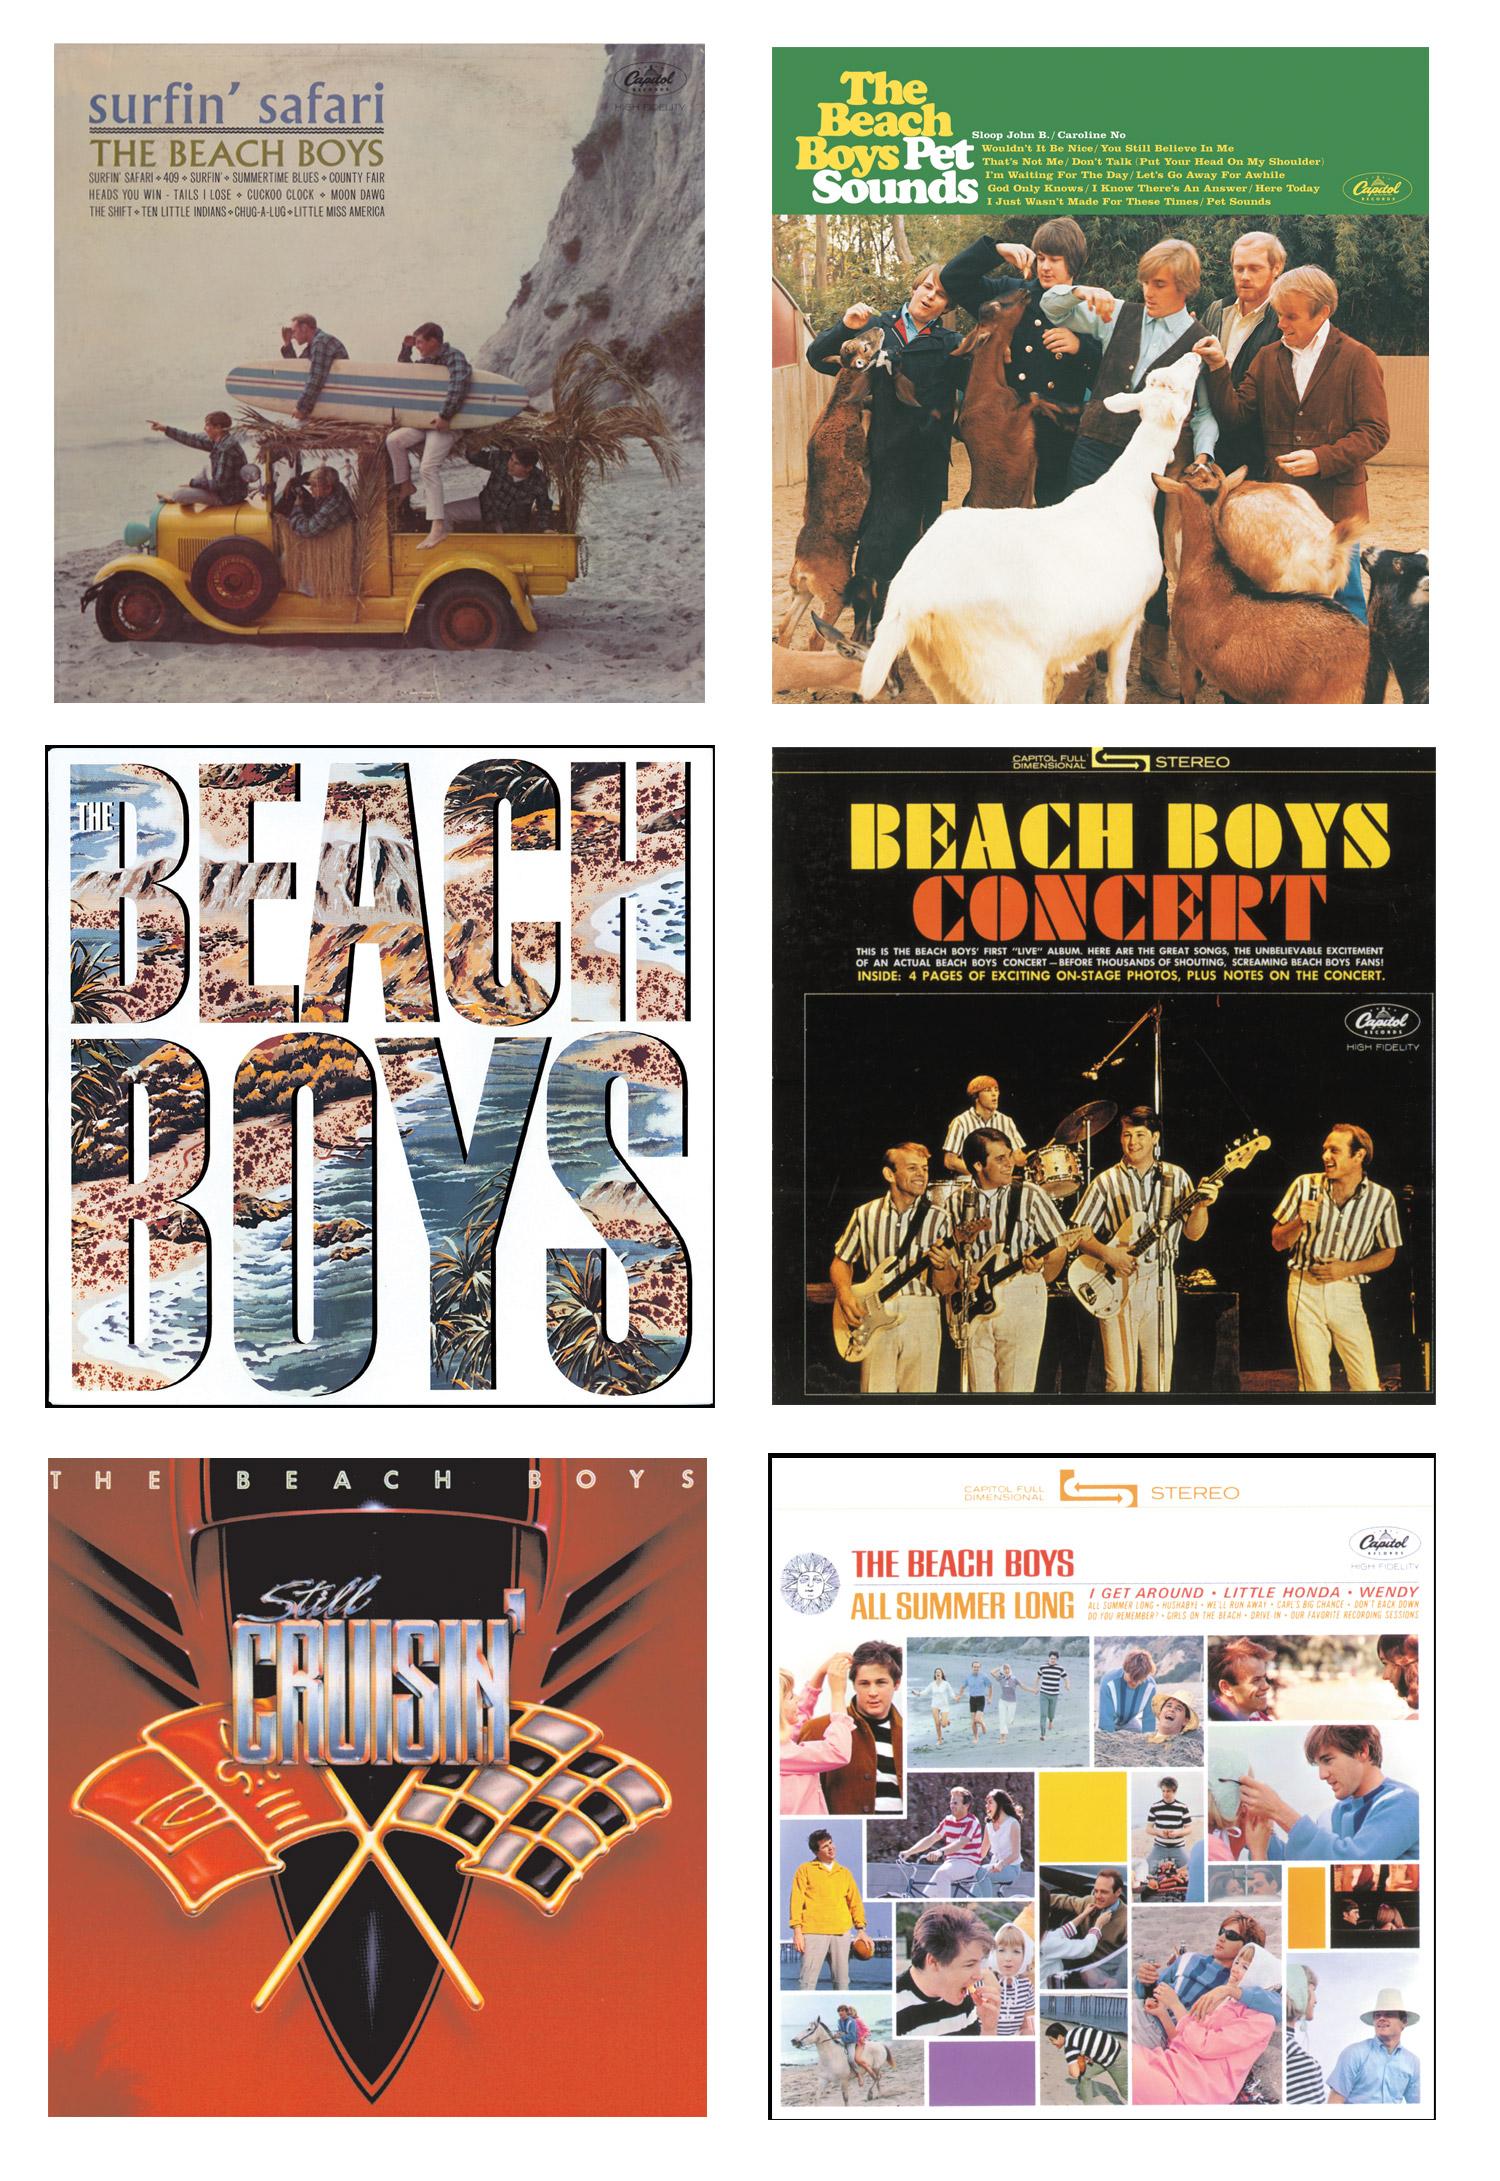 The Beach Boys x ROXY Collection